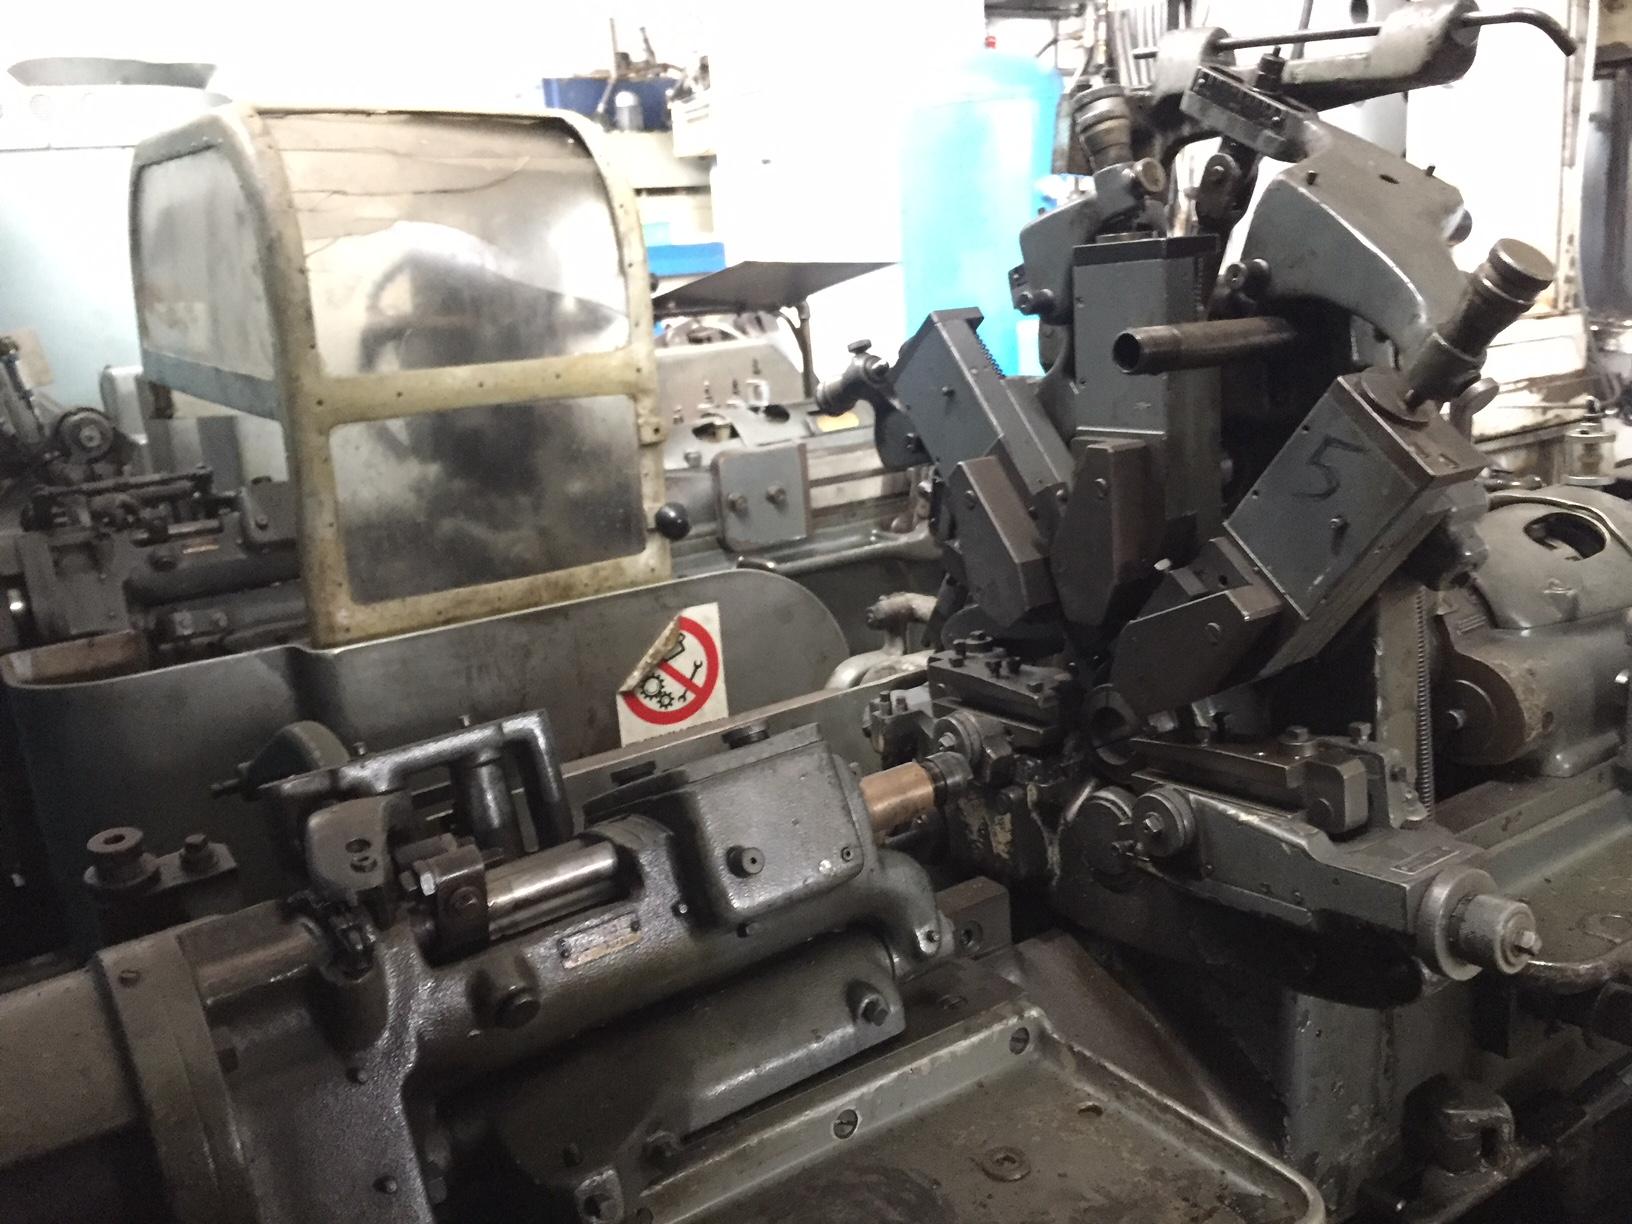 Lot 6 - Tornos Model RR 20 Single Spindle Automatic Lathe